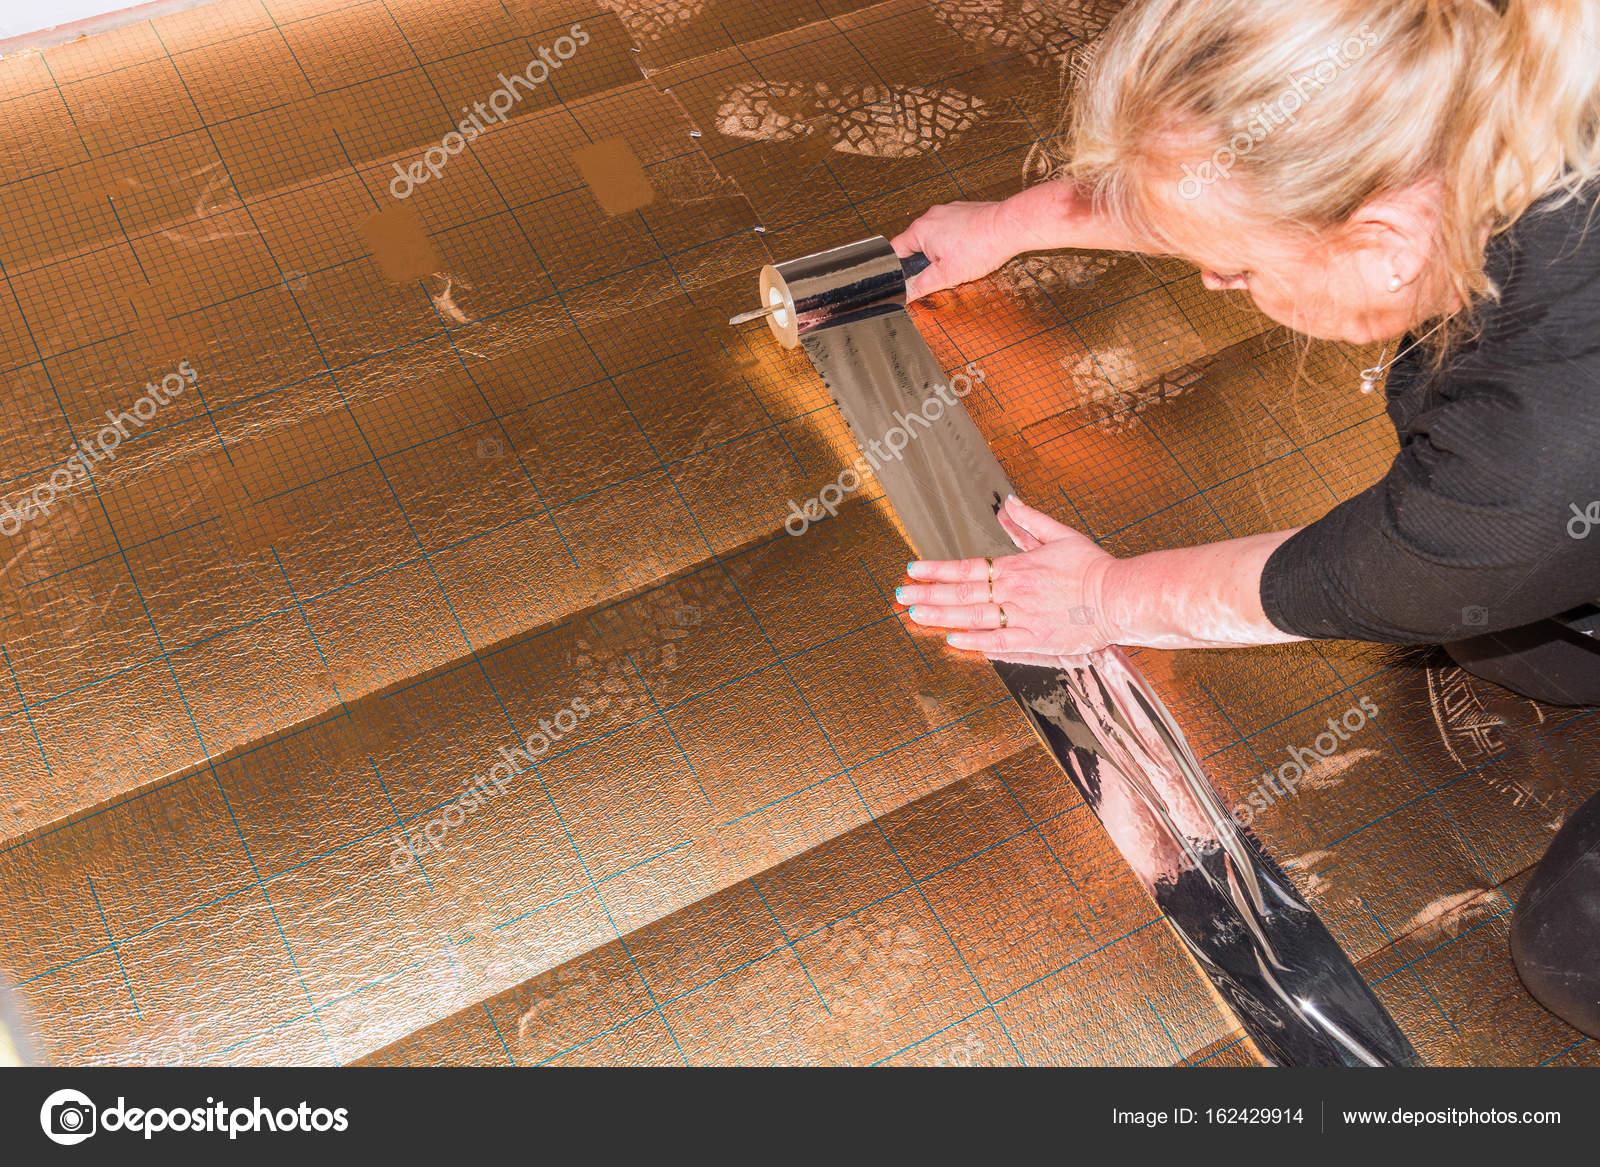 Laminaat Of Vinyl : Vinyl laminaat leggen in oud gebouw u2014 stockfoto © nikd51 #162429914